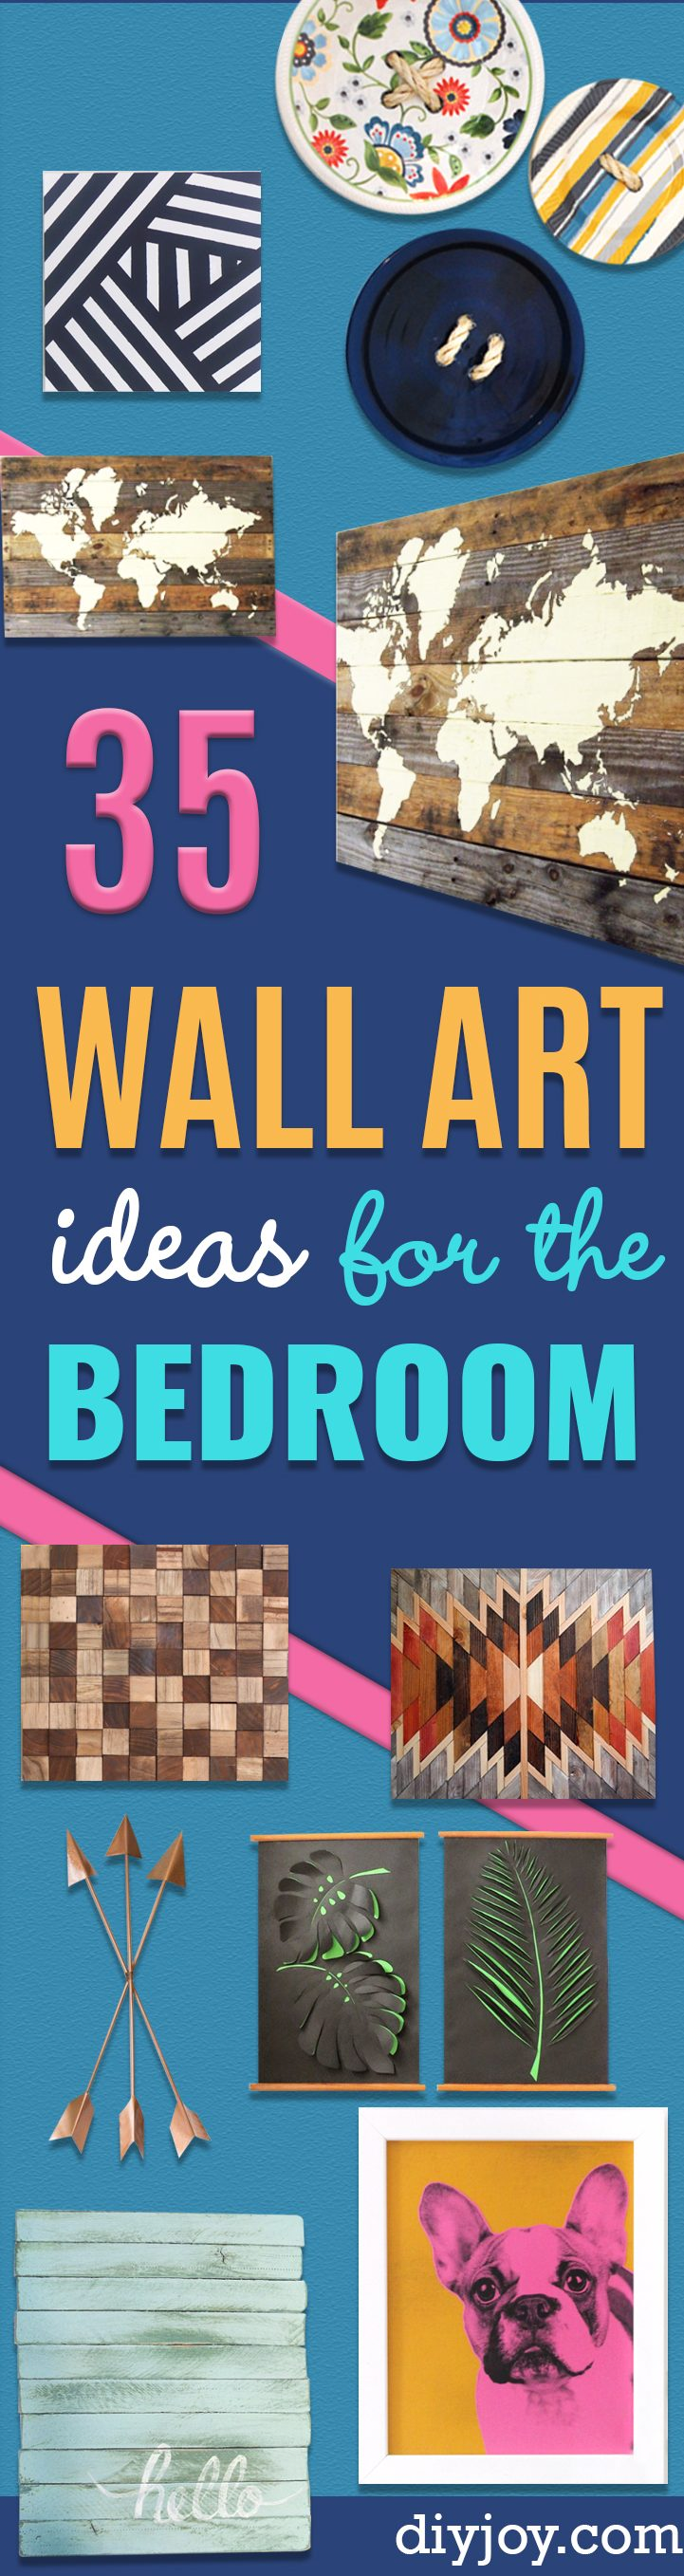 35 DIY Wall Art Ideas for the Bedroom